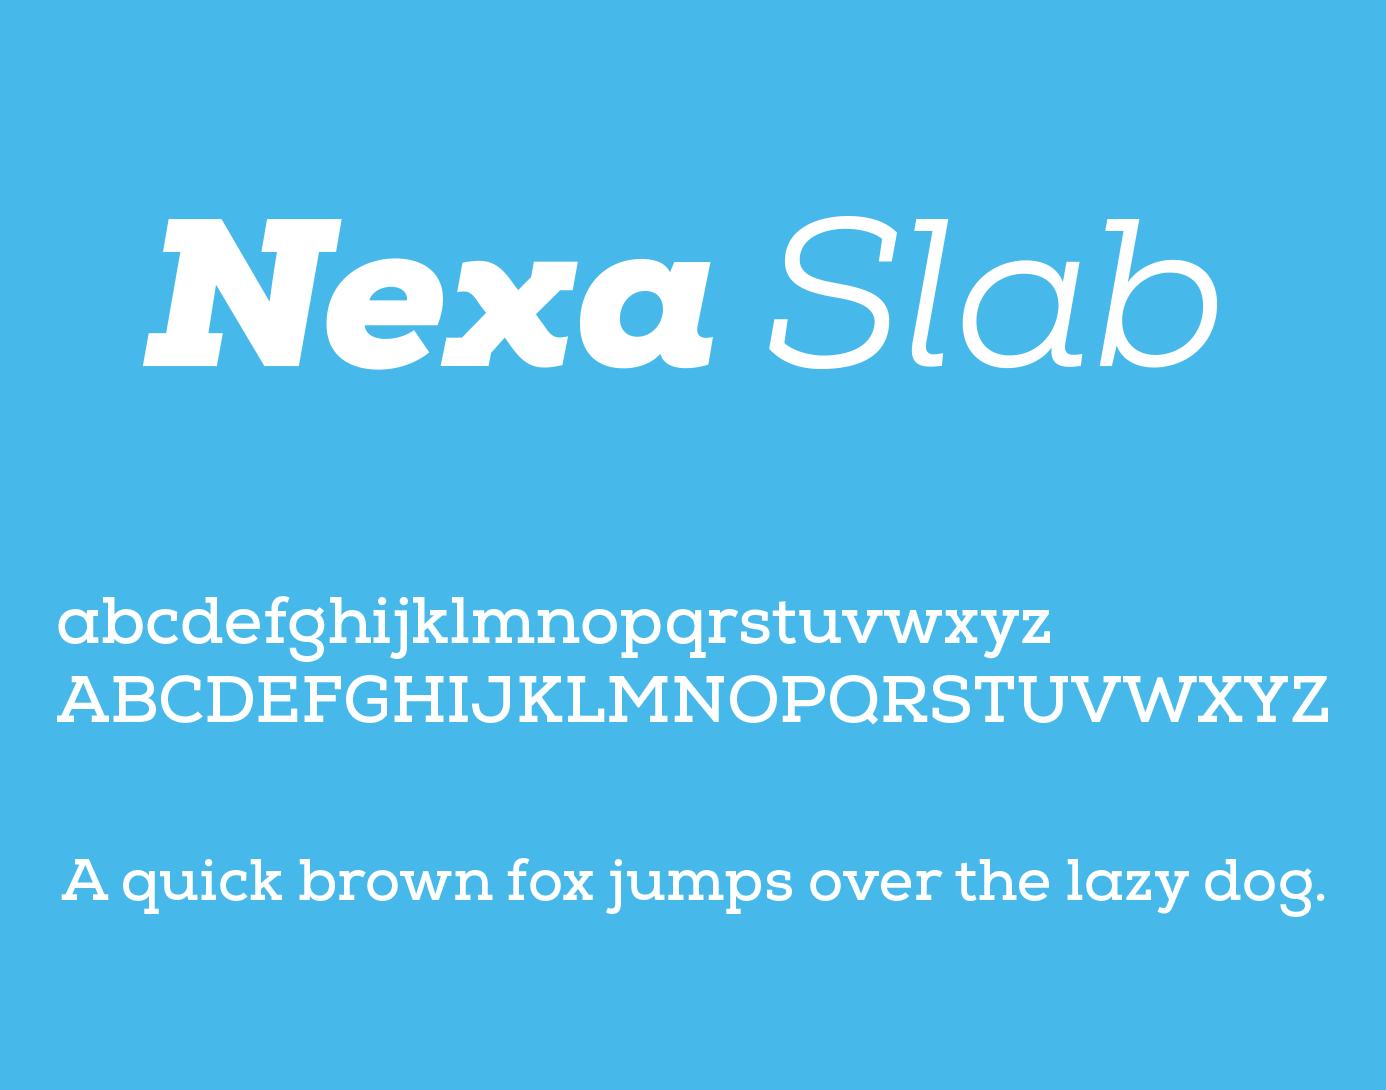 https://fontclarity.com/wp-content/uploads/2019/09/nexa-slab-font-download-0.png Free Download